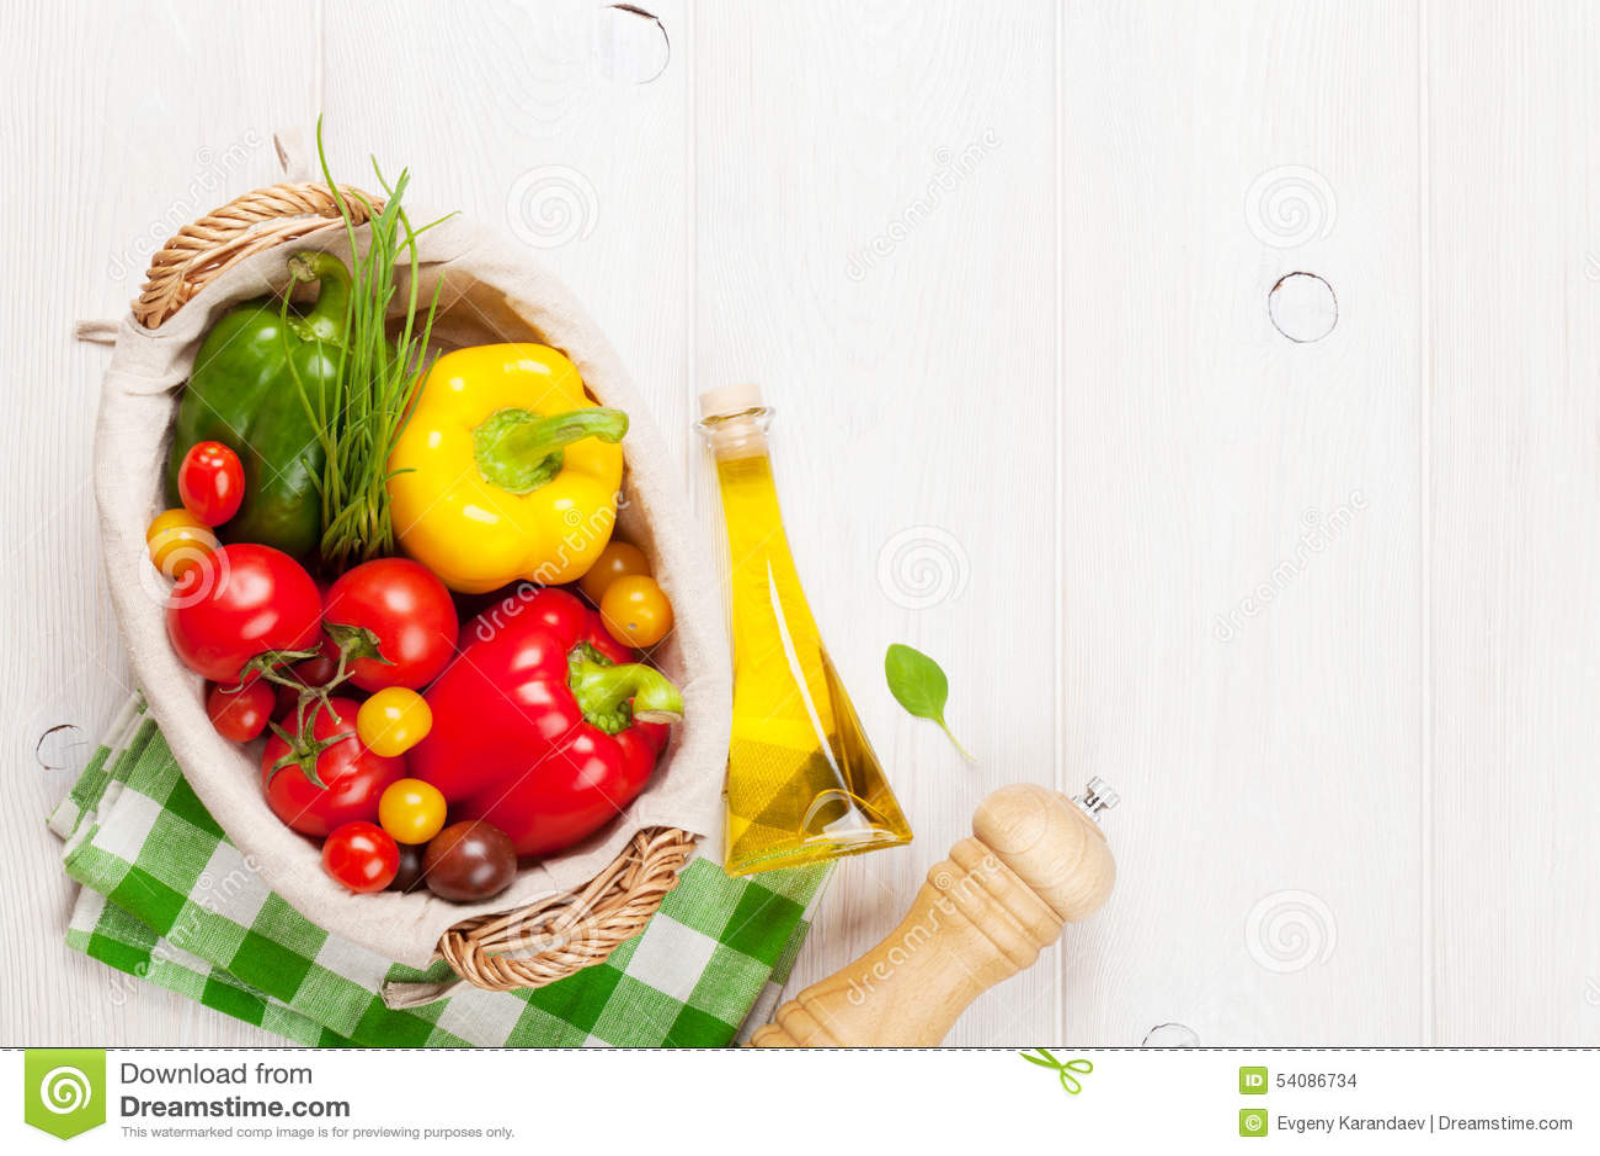 Verse groenten en specerijen op houten lijst